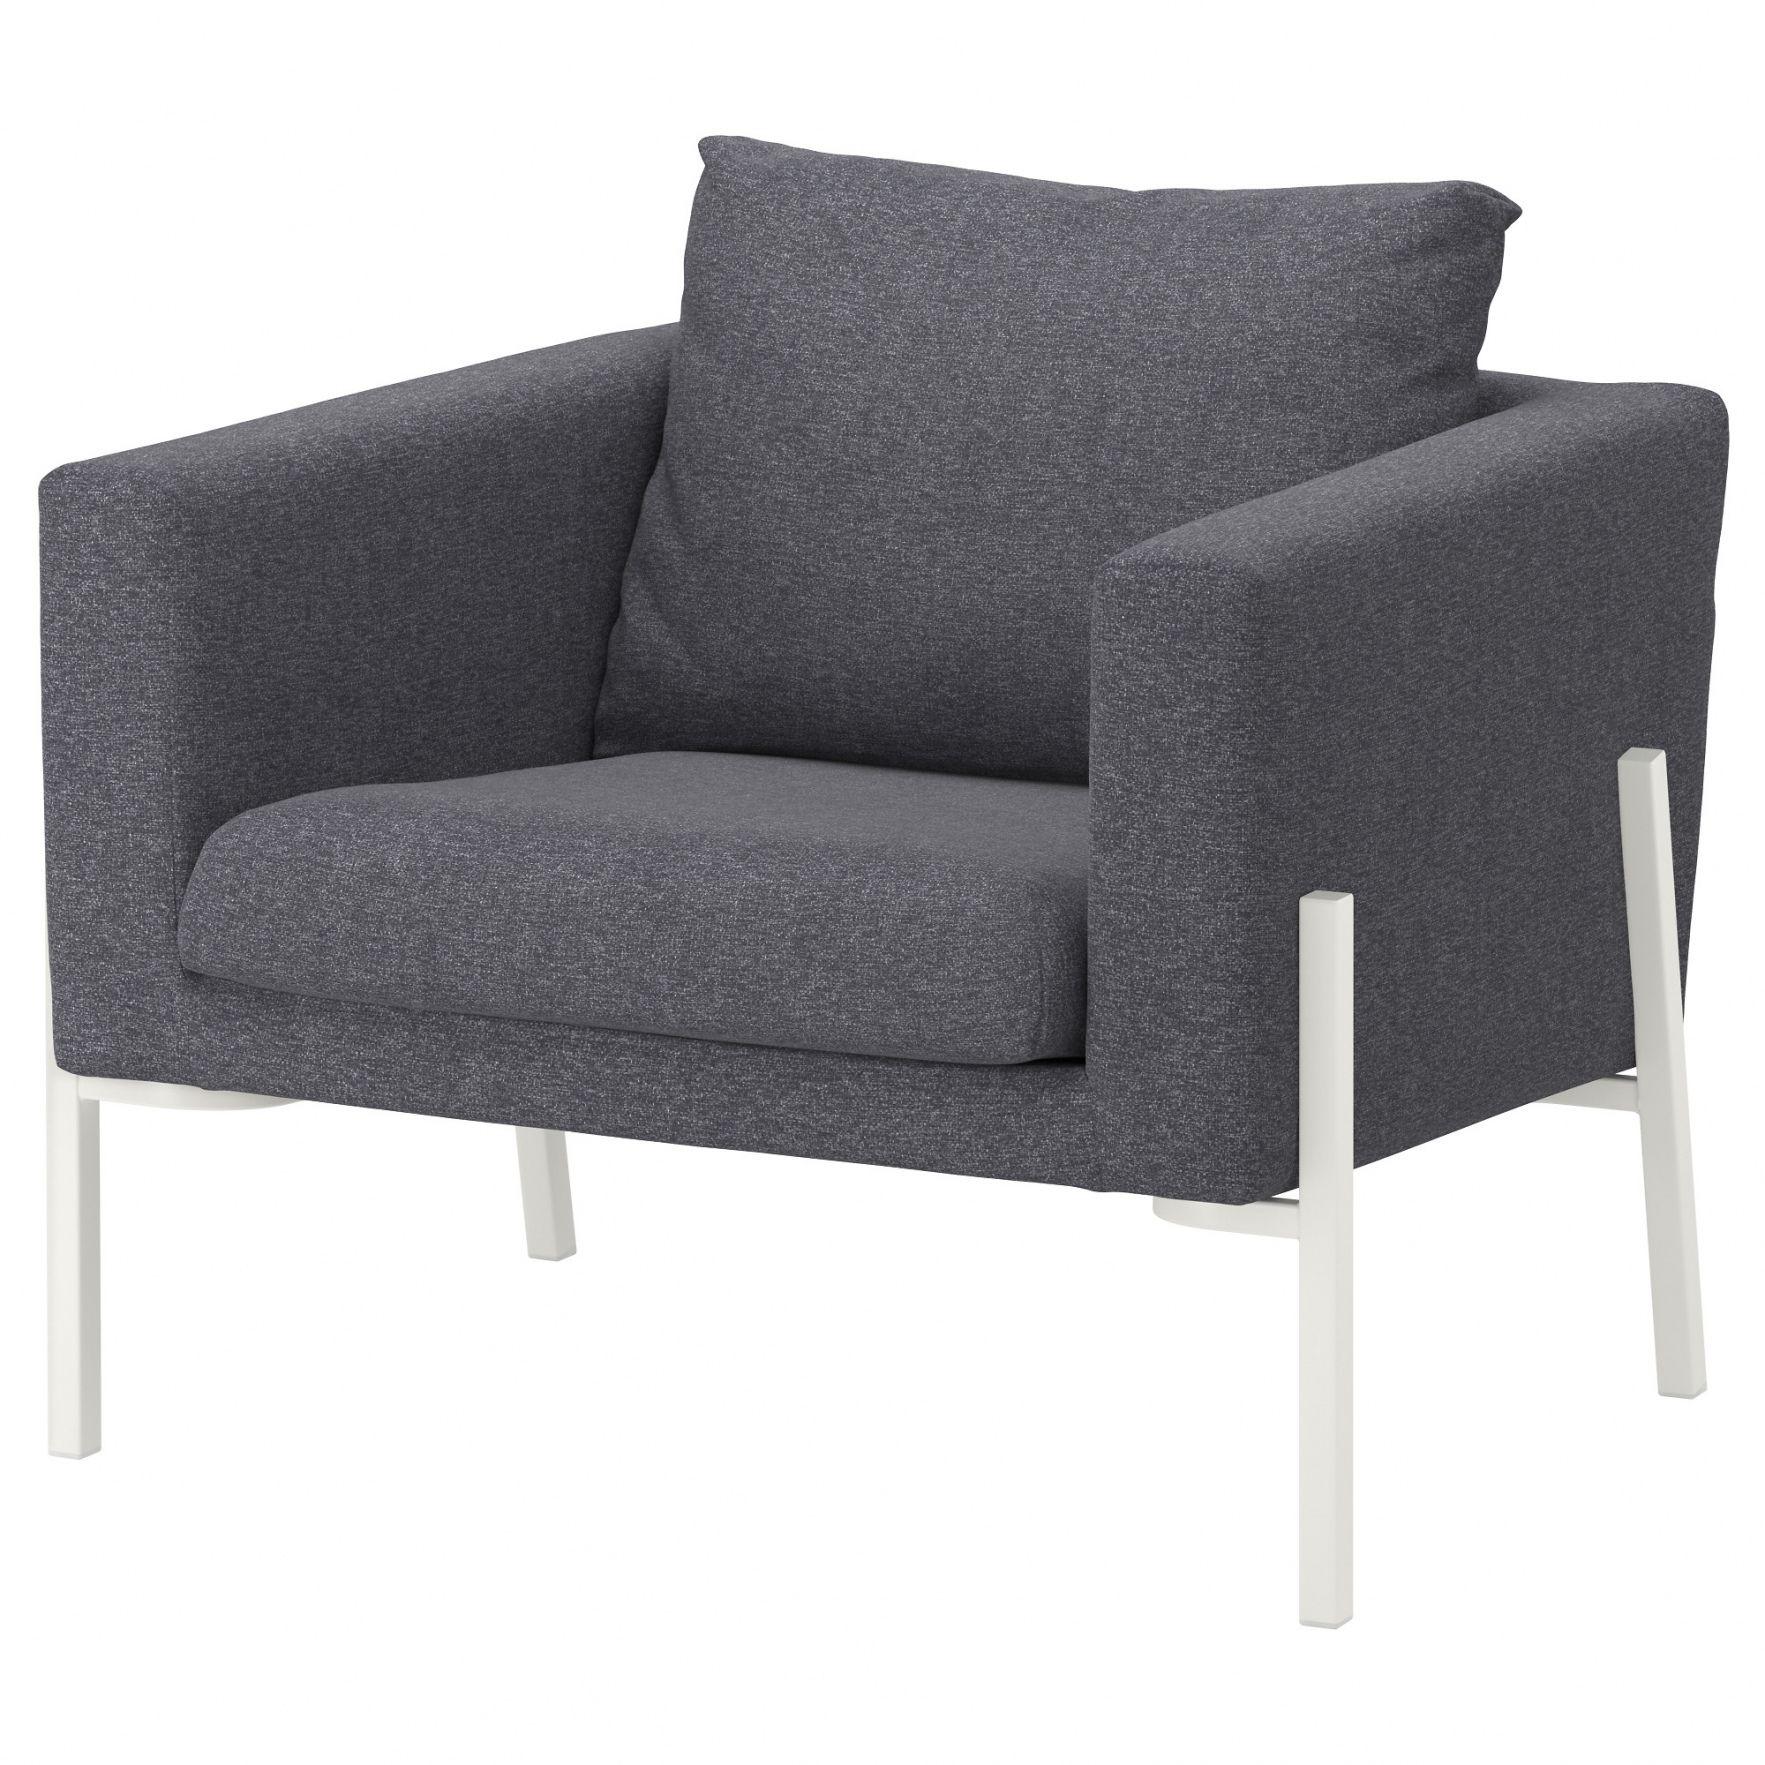 77 glider chair ikea best cheap modern furniture check more at